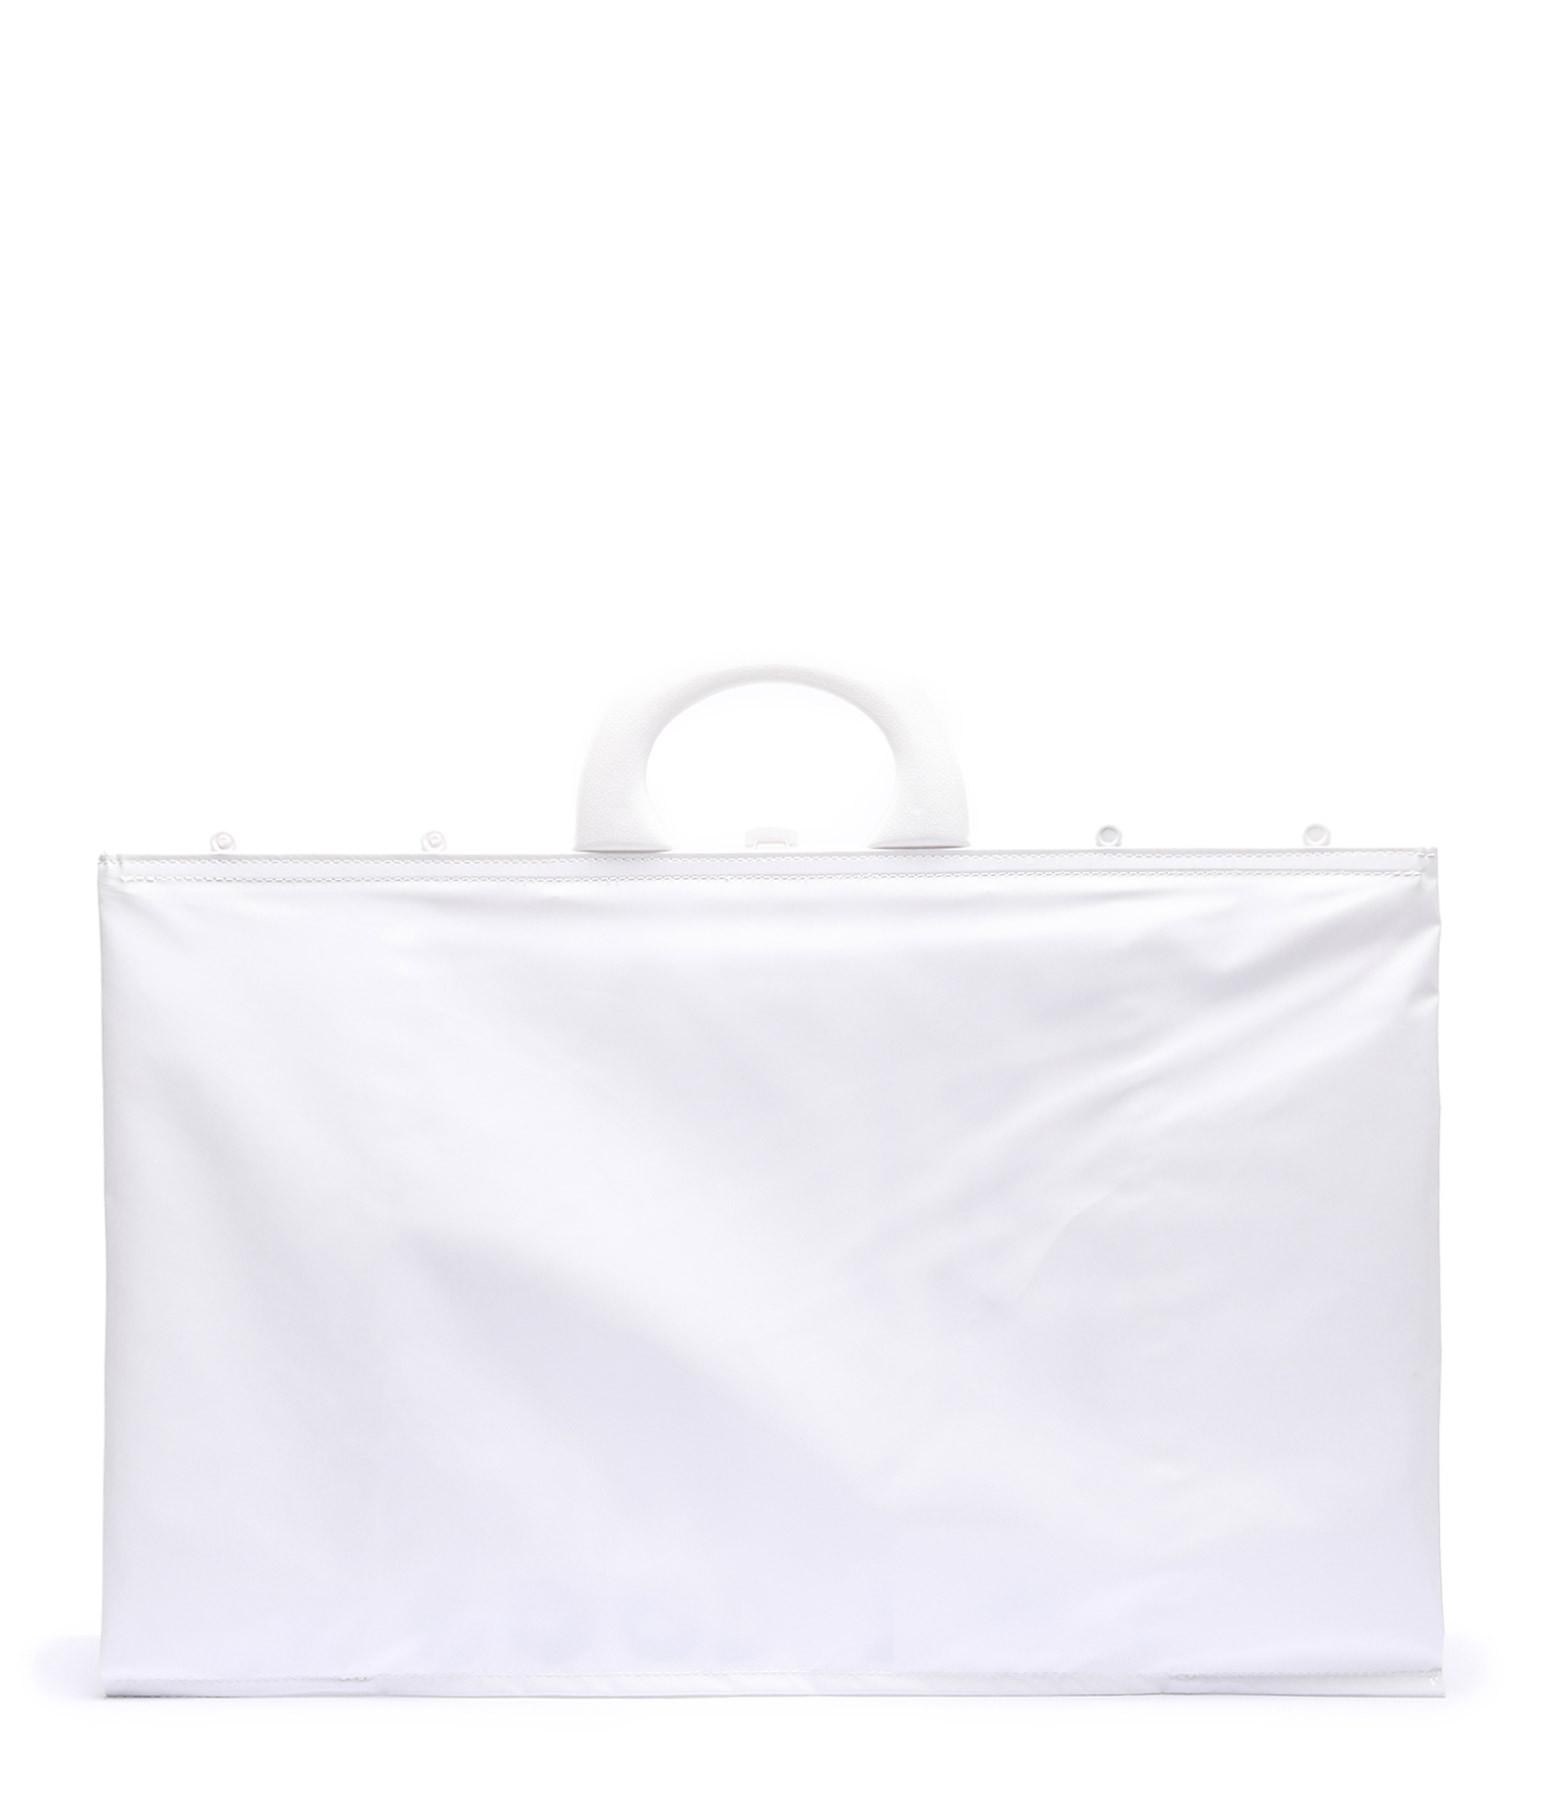 MM6 MAISON MARGIELA - Sac Rectangle Blanc Collection Studio